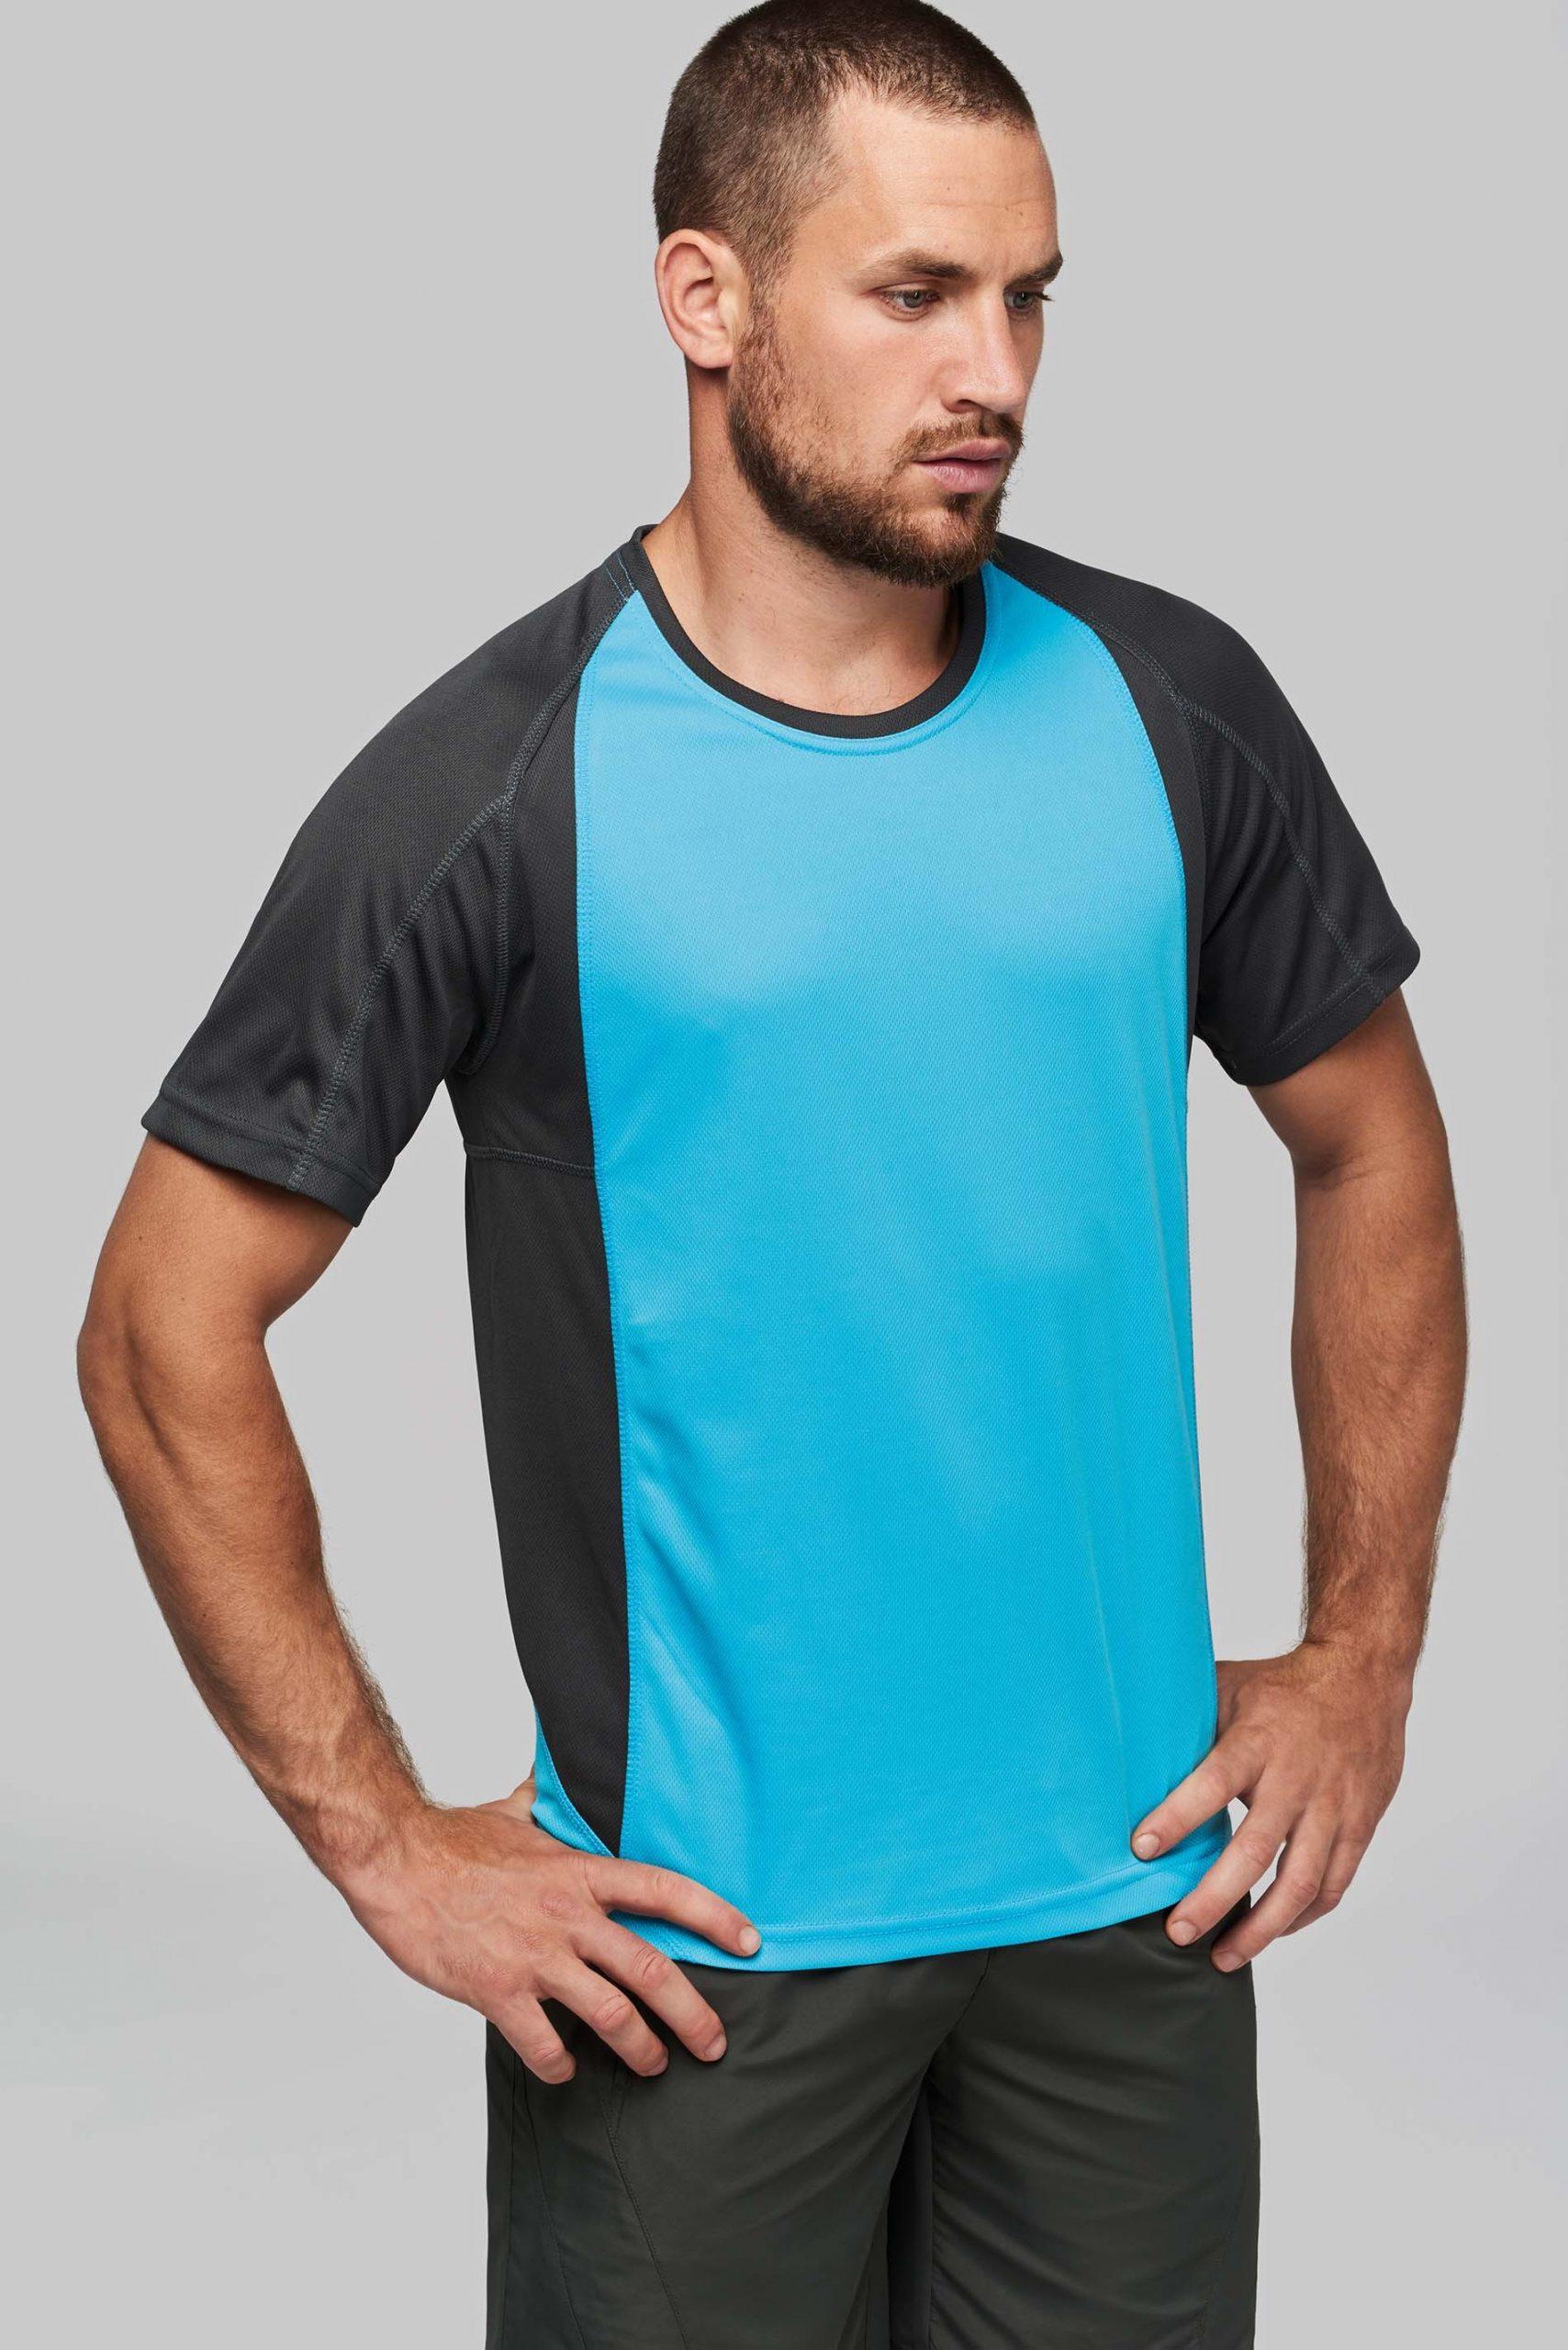 Bicolour Short Sleeve Crew Neck T-shirt Men